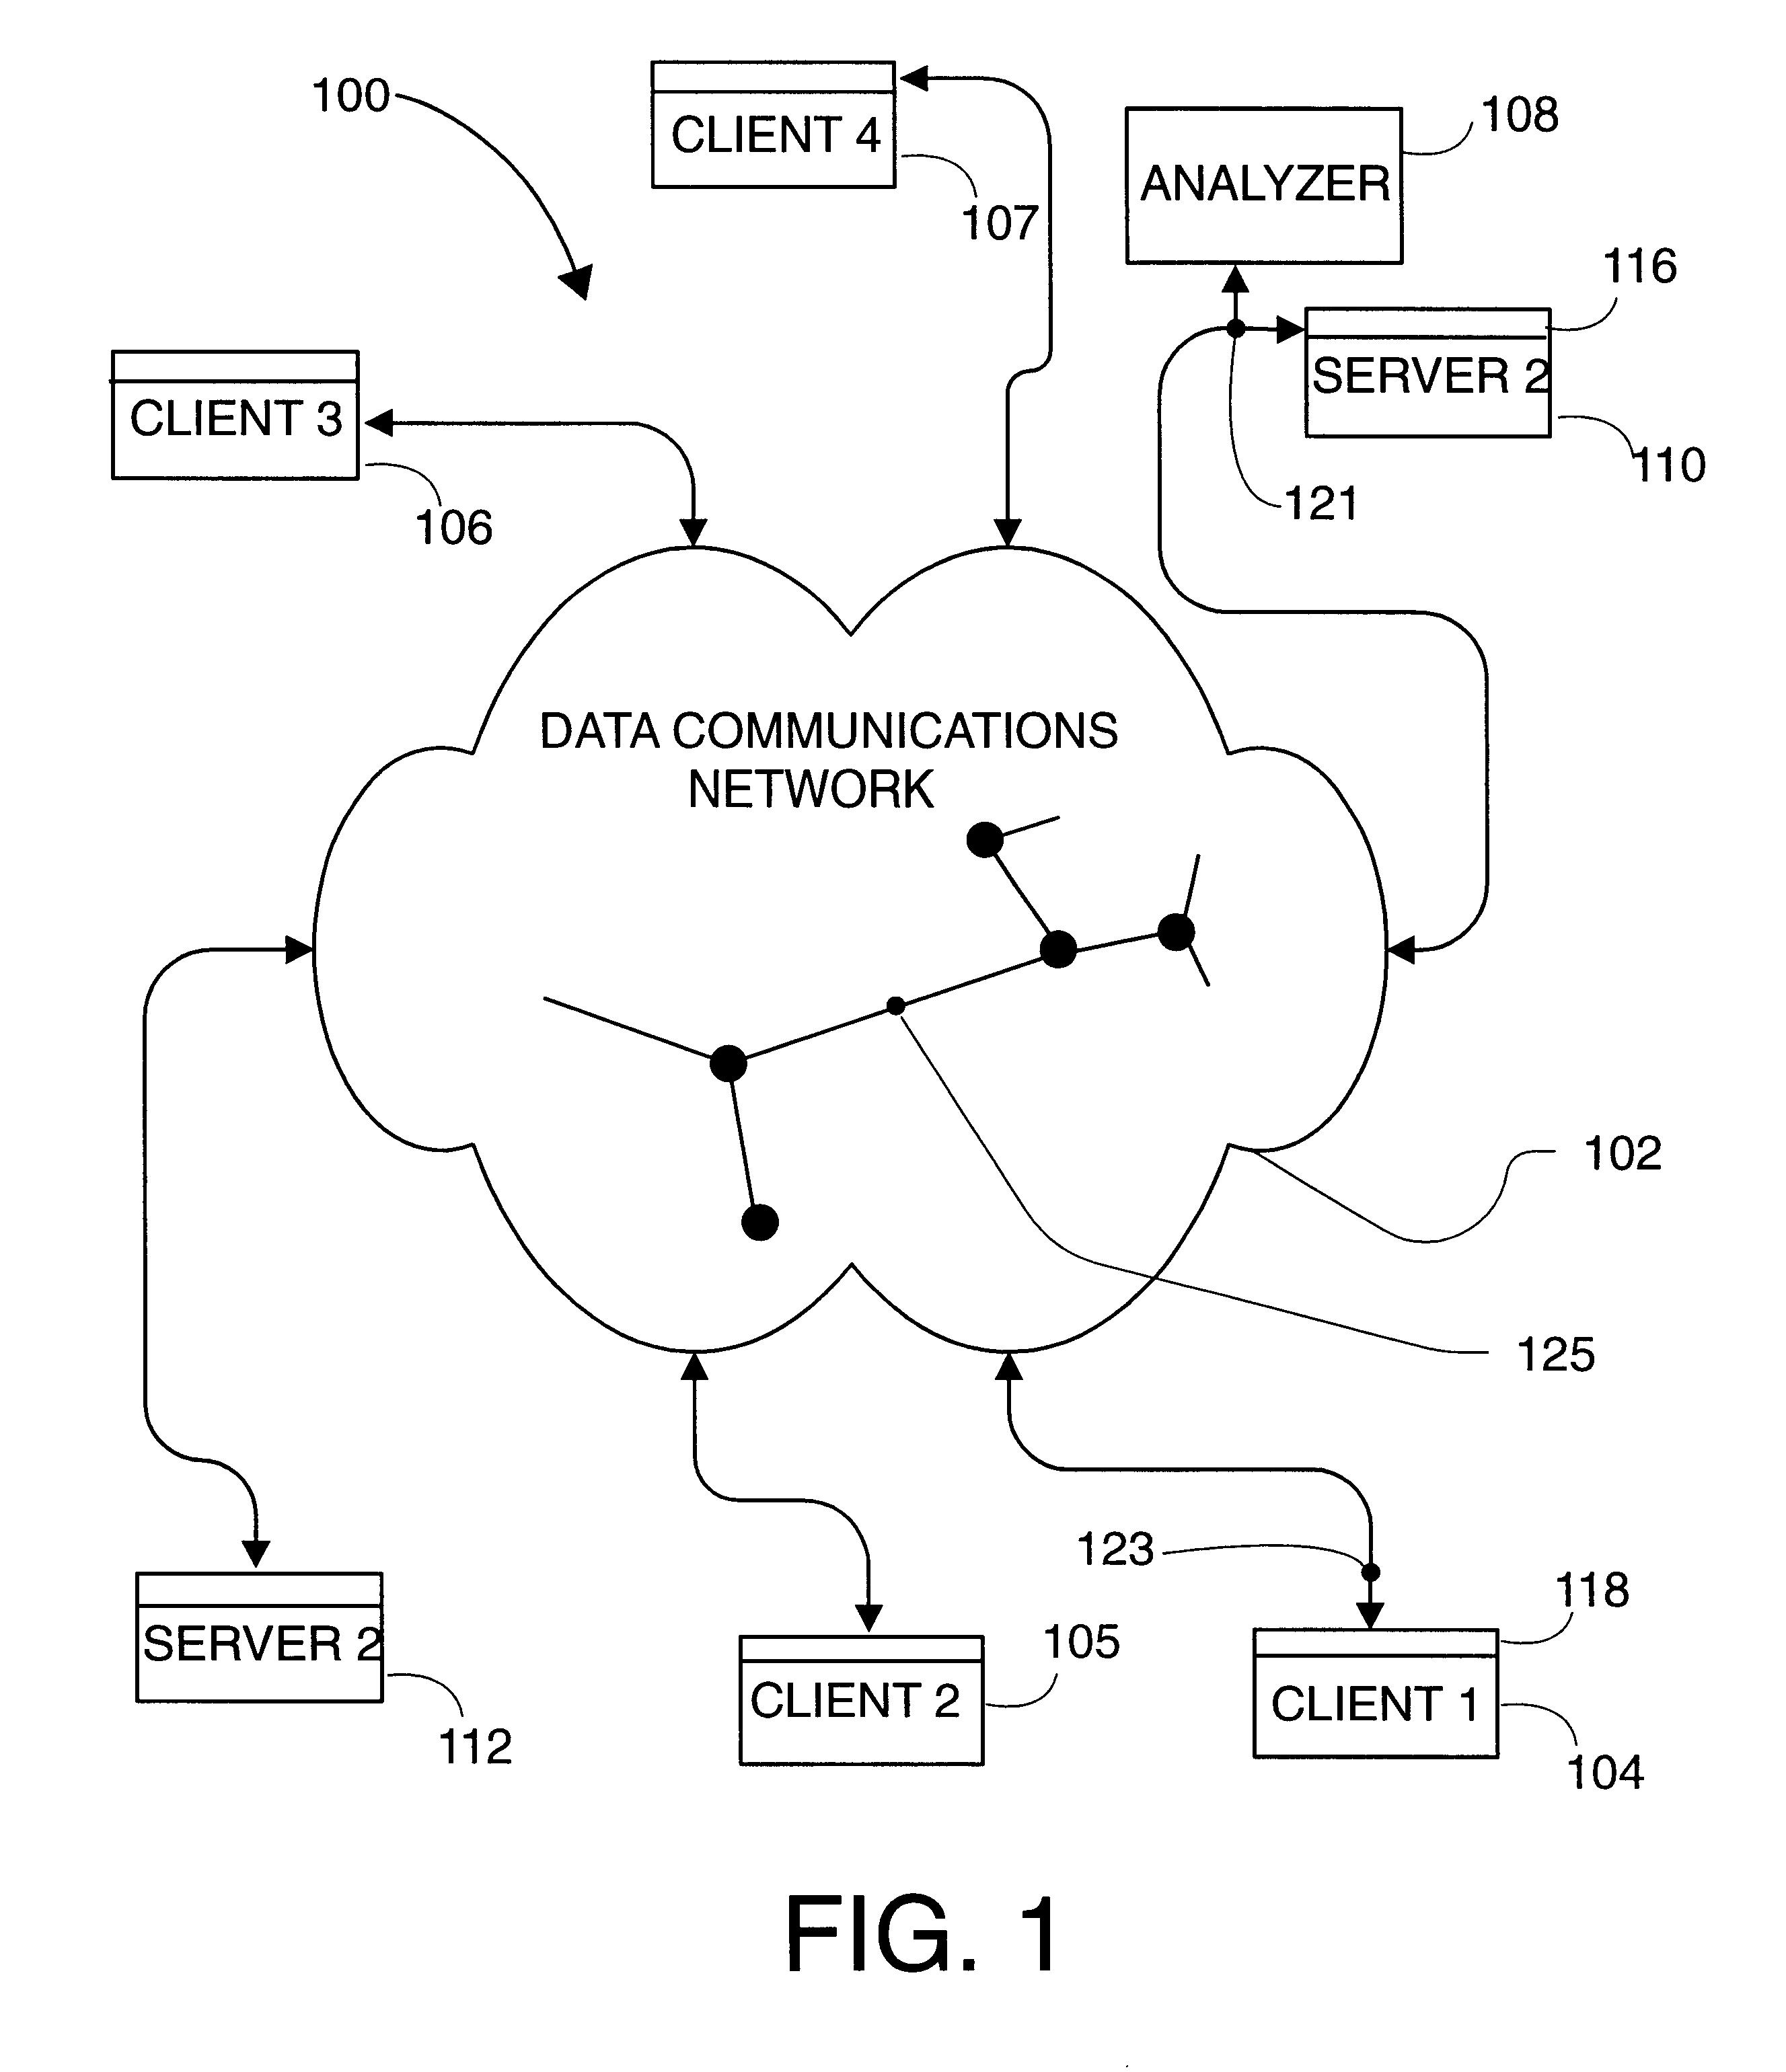 Patent US 6,665,725 B1